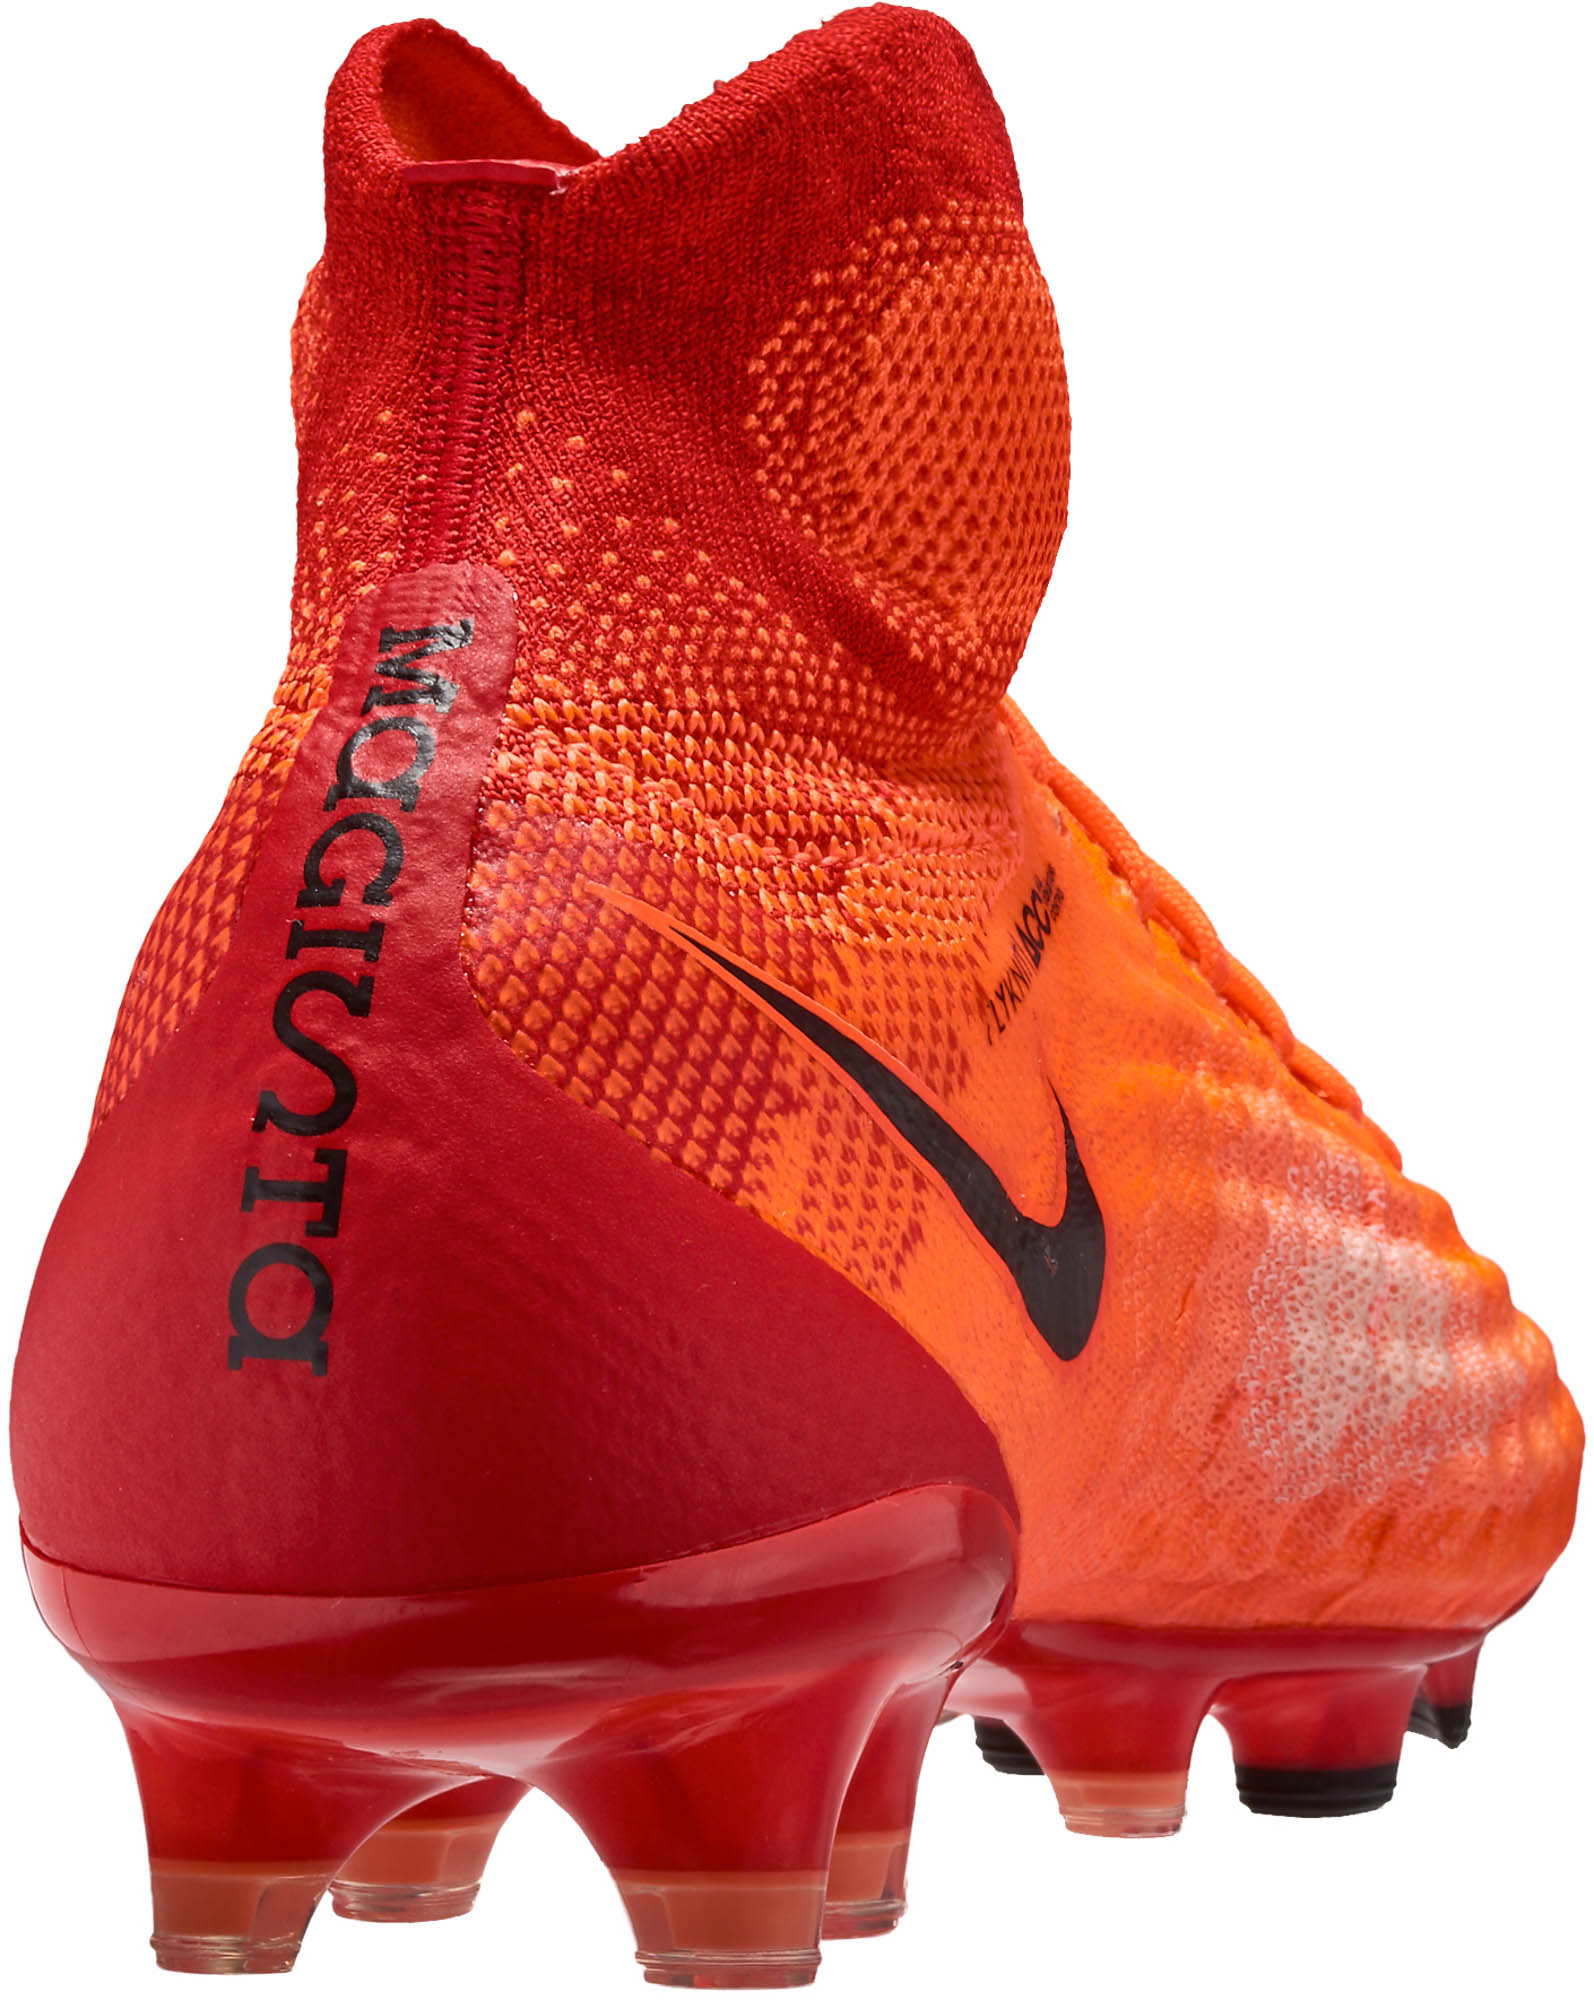 promo code 8de68 00b01 Nike Magista Obra II FG Soccer Cleats - Total Crimson  Unive